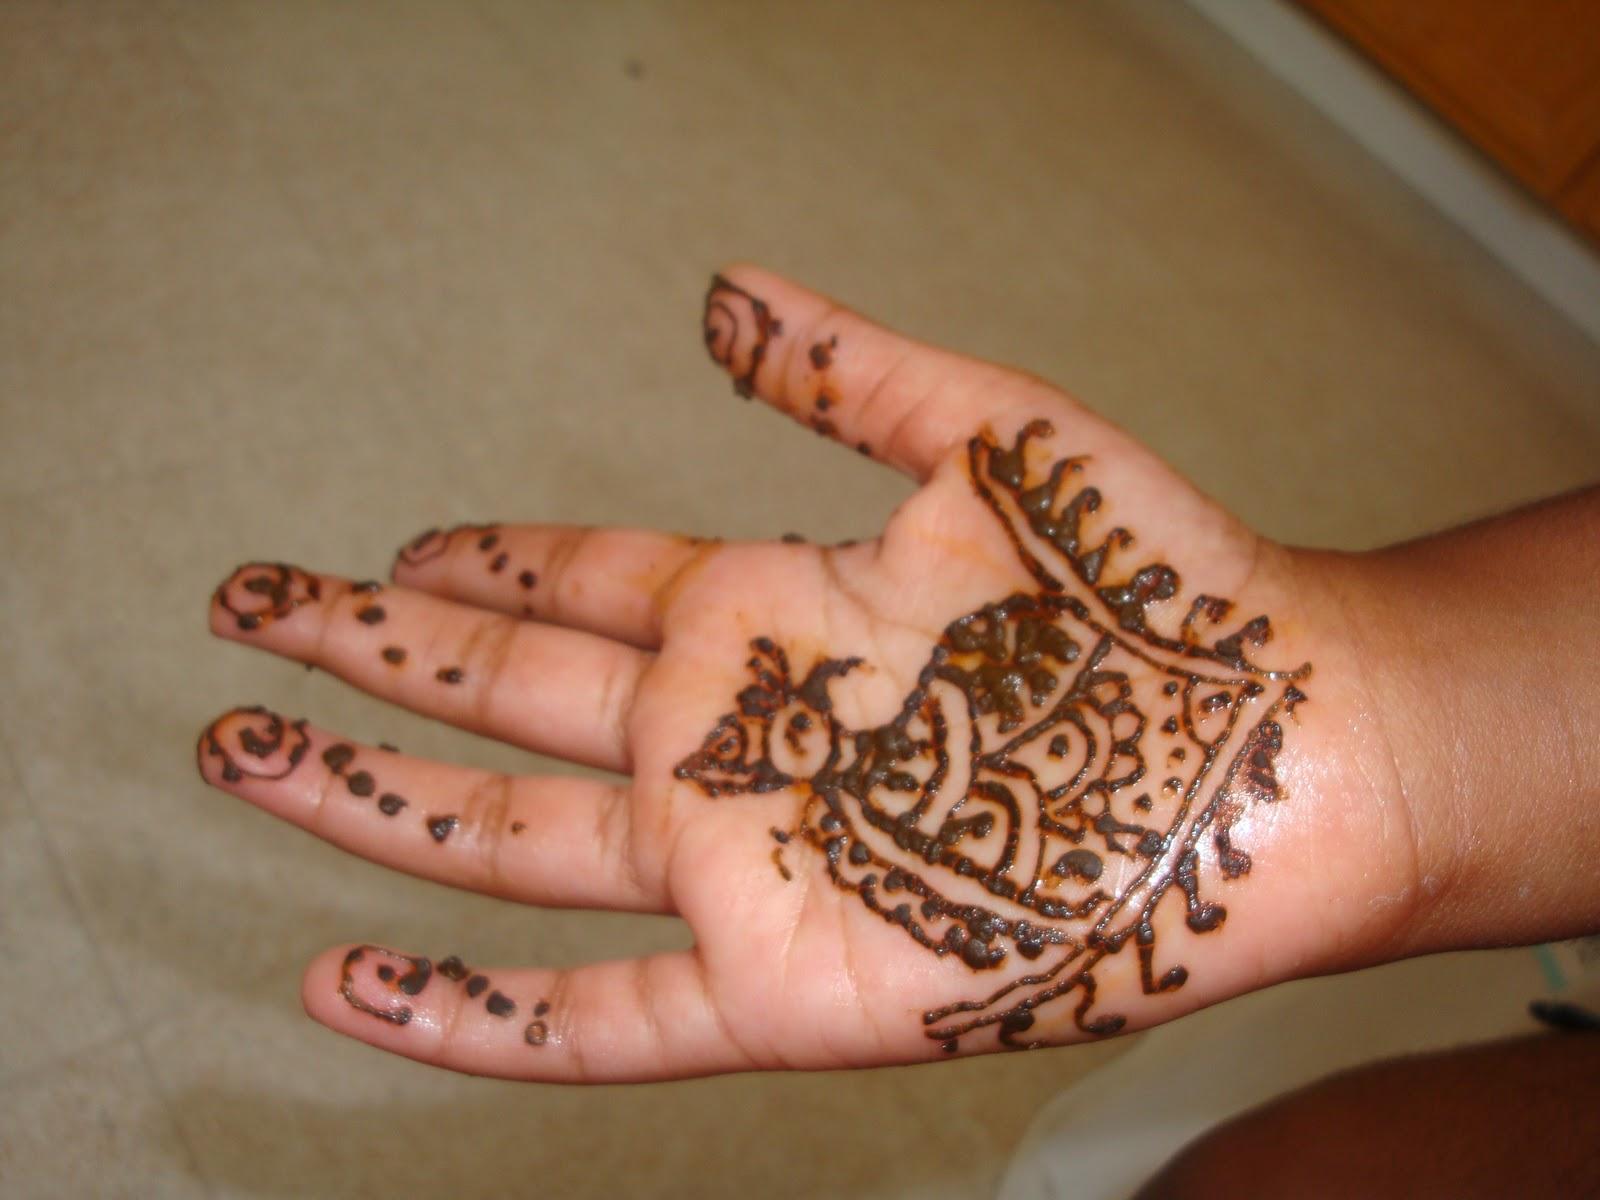 Hobby Hut: Simple Mehendi/Henna designs for Kids